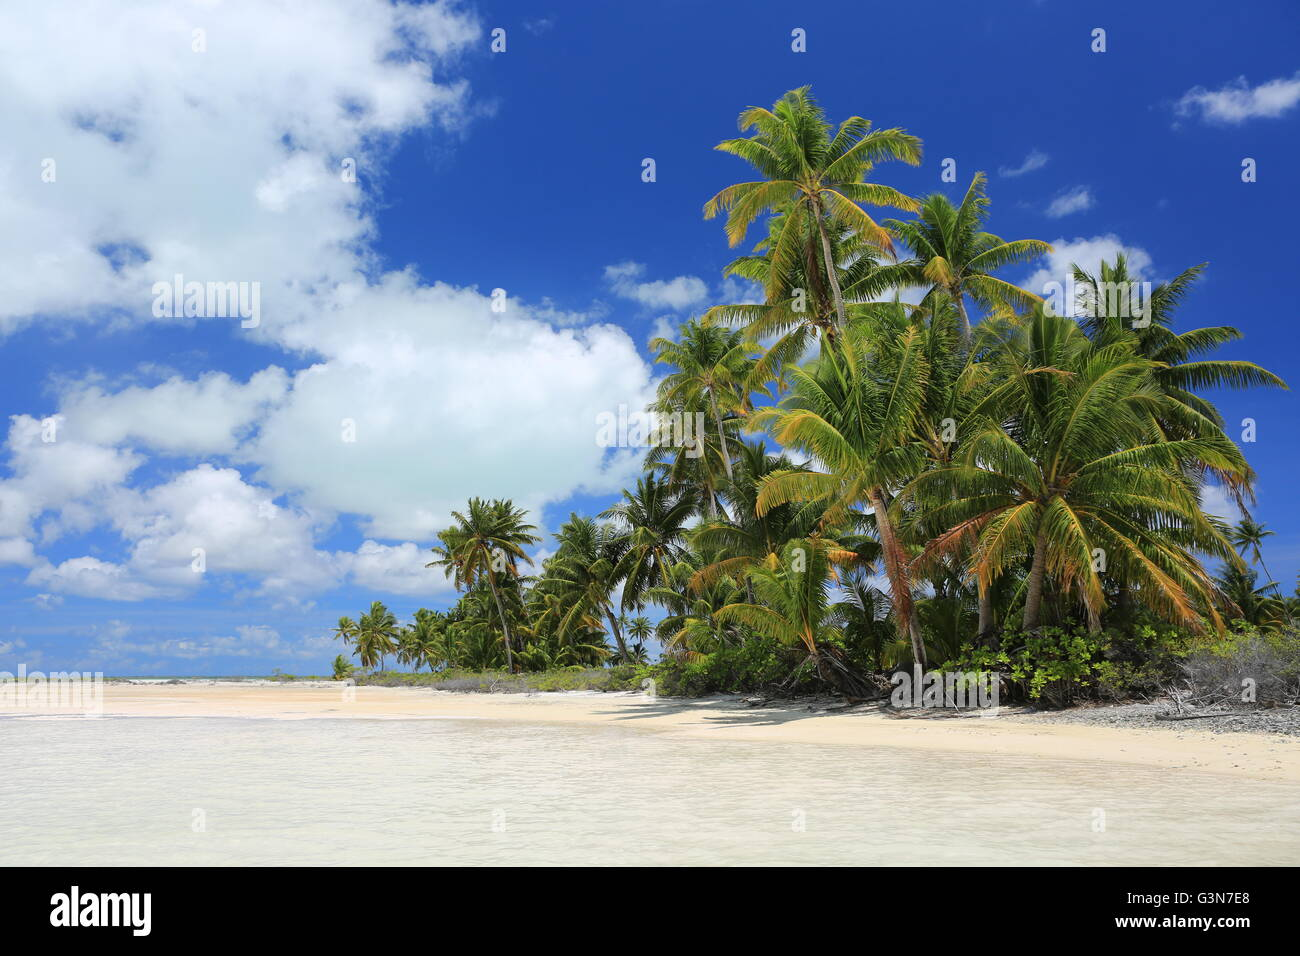 Coconut palms at the beach, Christmas Island, Kiribati - Stock Image